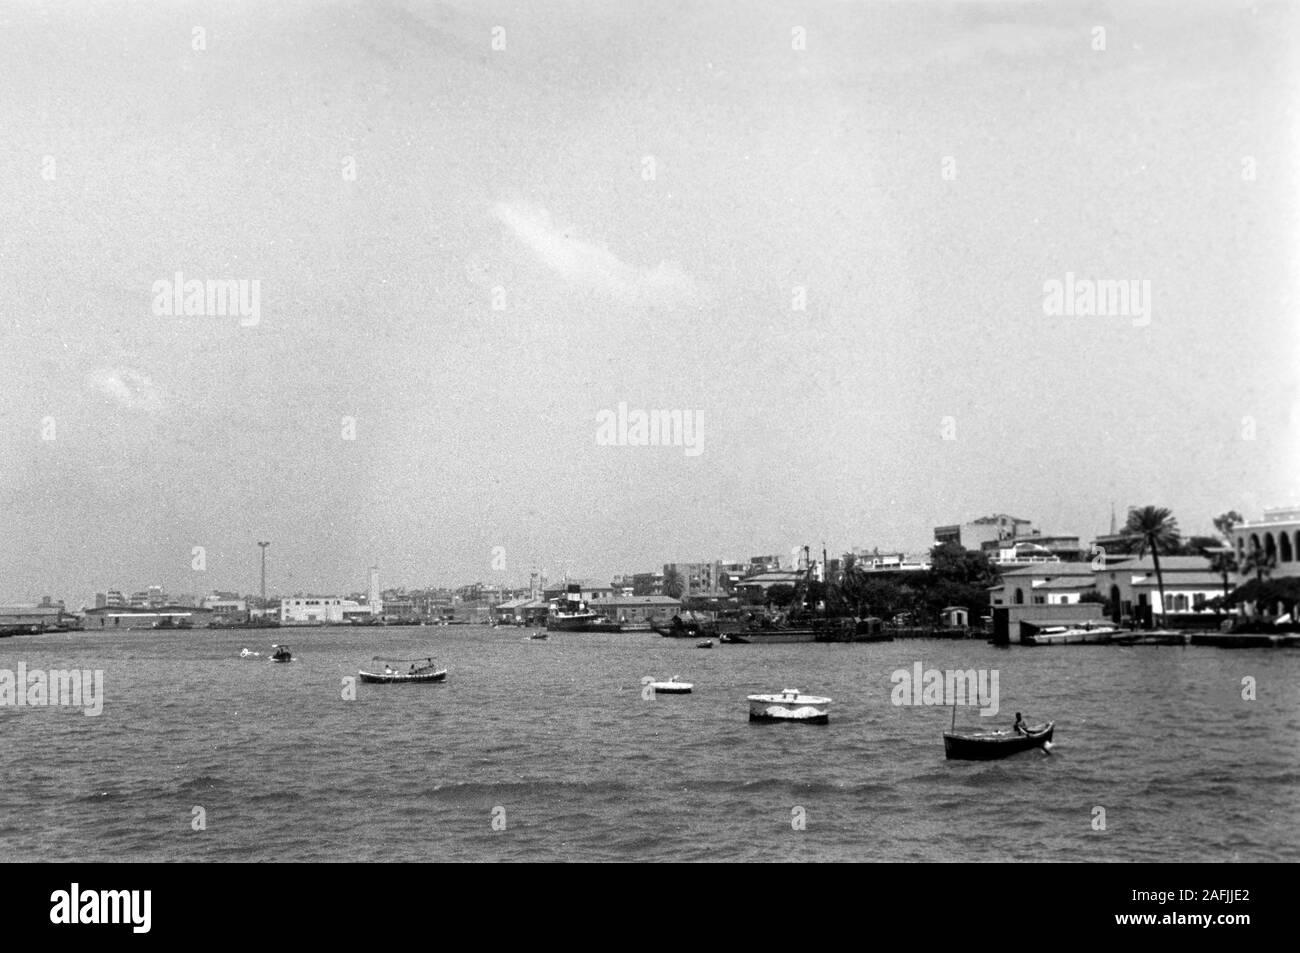 Port Said am Suezkanal, 1955. Port Said at Suez Canal, 1955. Stock Photo